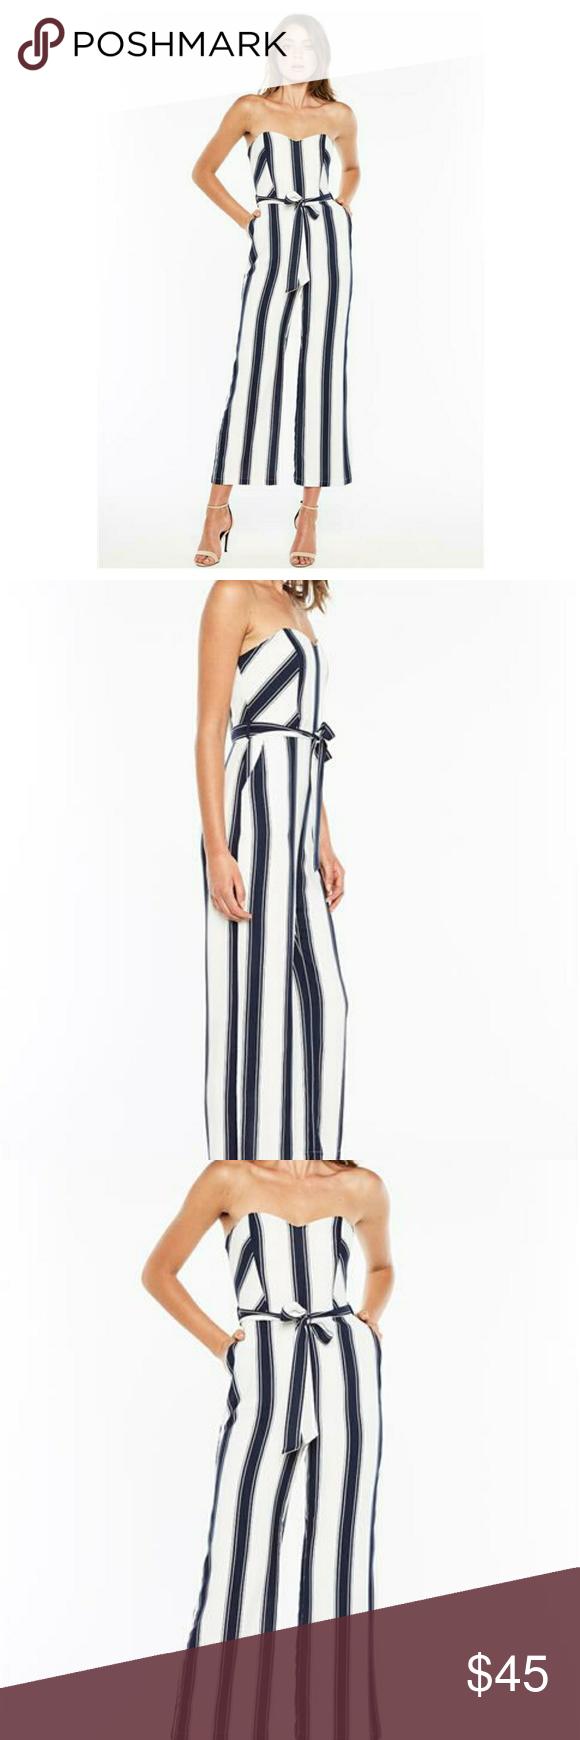 084f3d96aa1c Bardot Evie Striped Tie Waist Jumpsuit Beautiful striped zipper back  jumpsuit. Size 6 small Striped and strapless Pockets 30